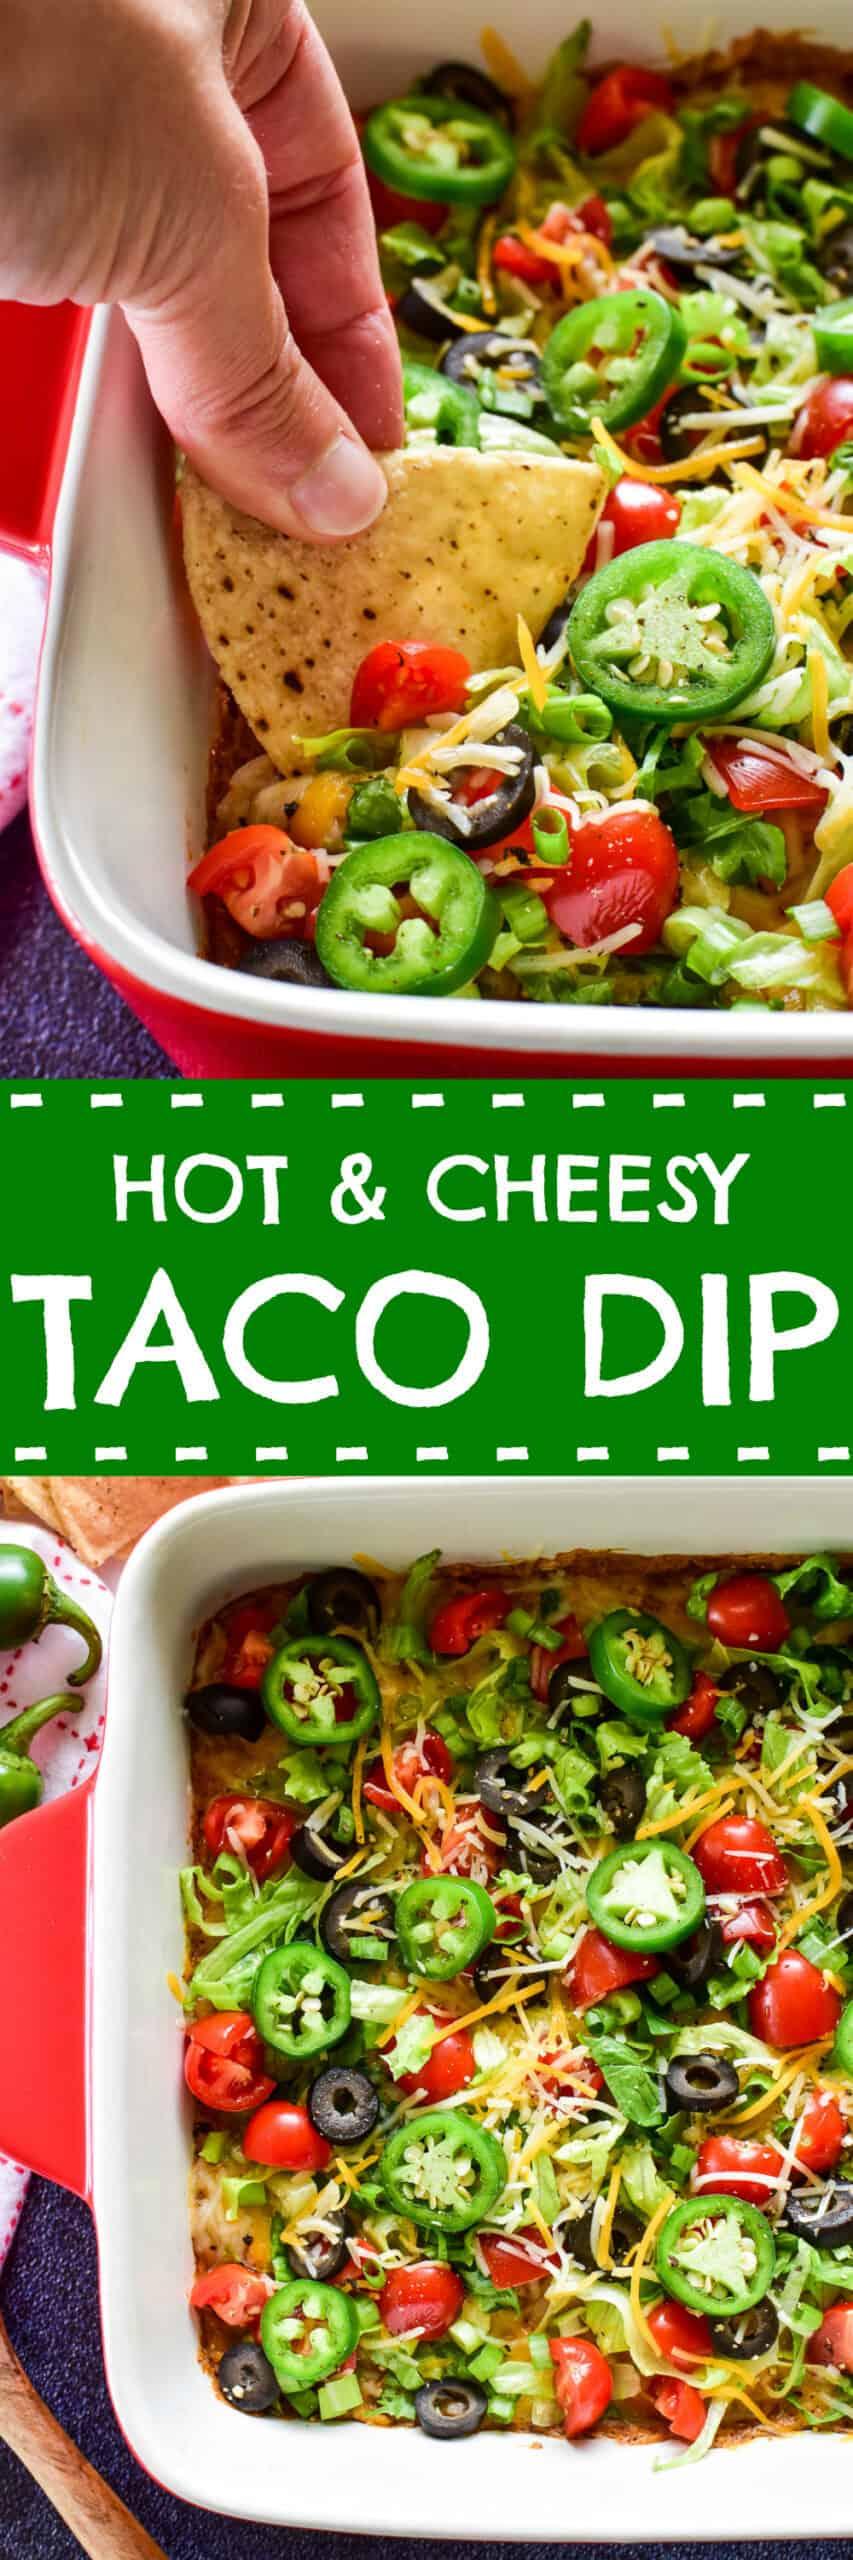 Taco Dip collage image